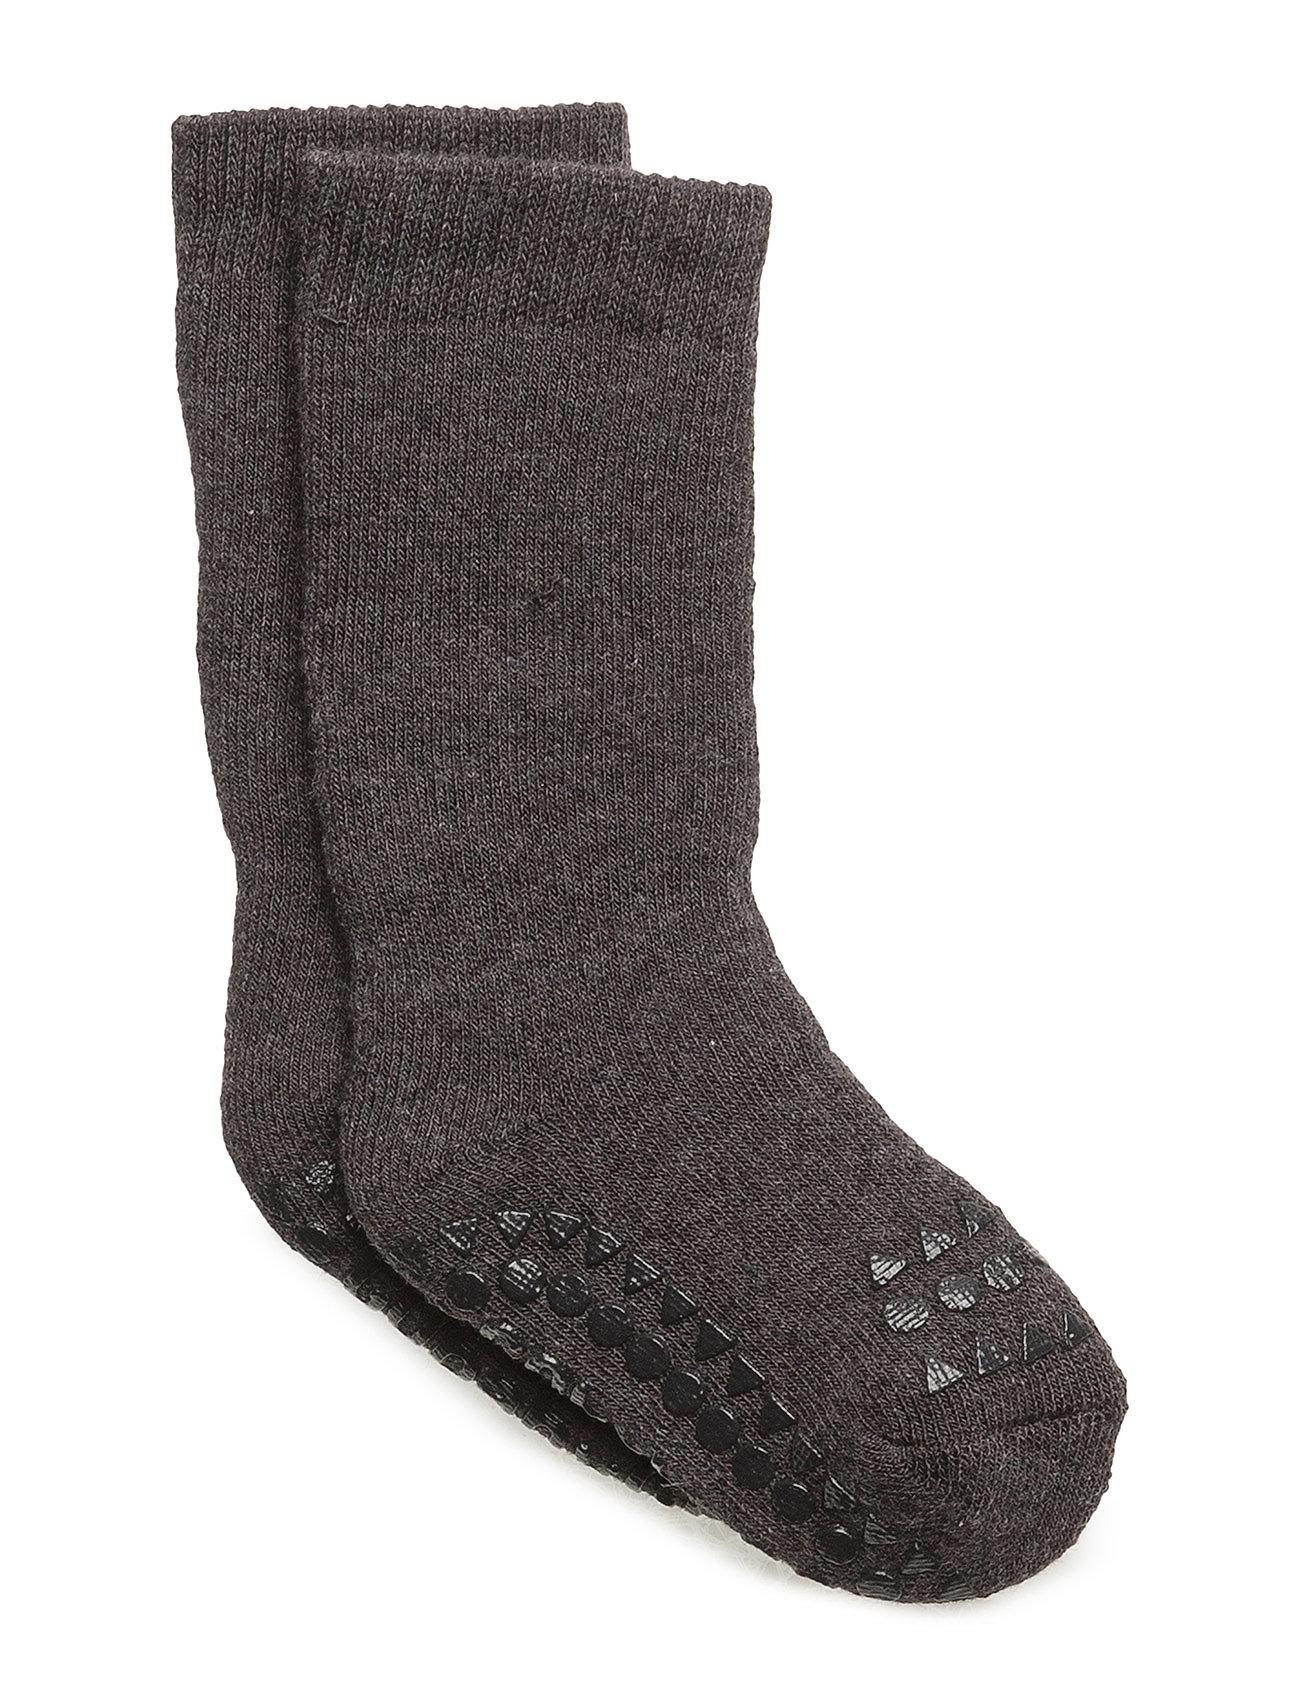 GoBabyGo Socks - DARK GREY MéLANGE